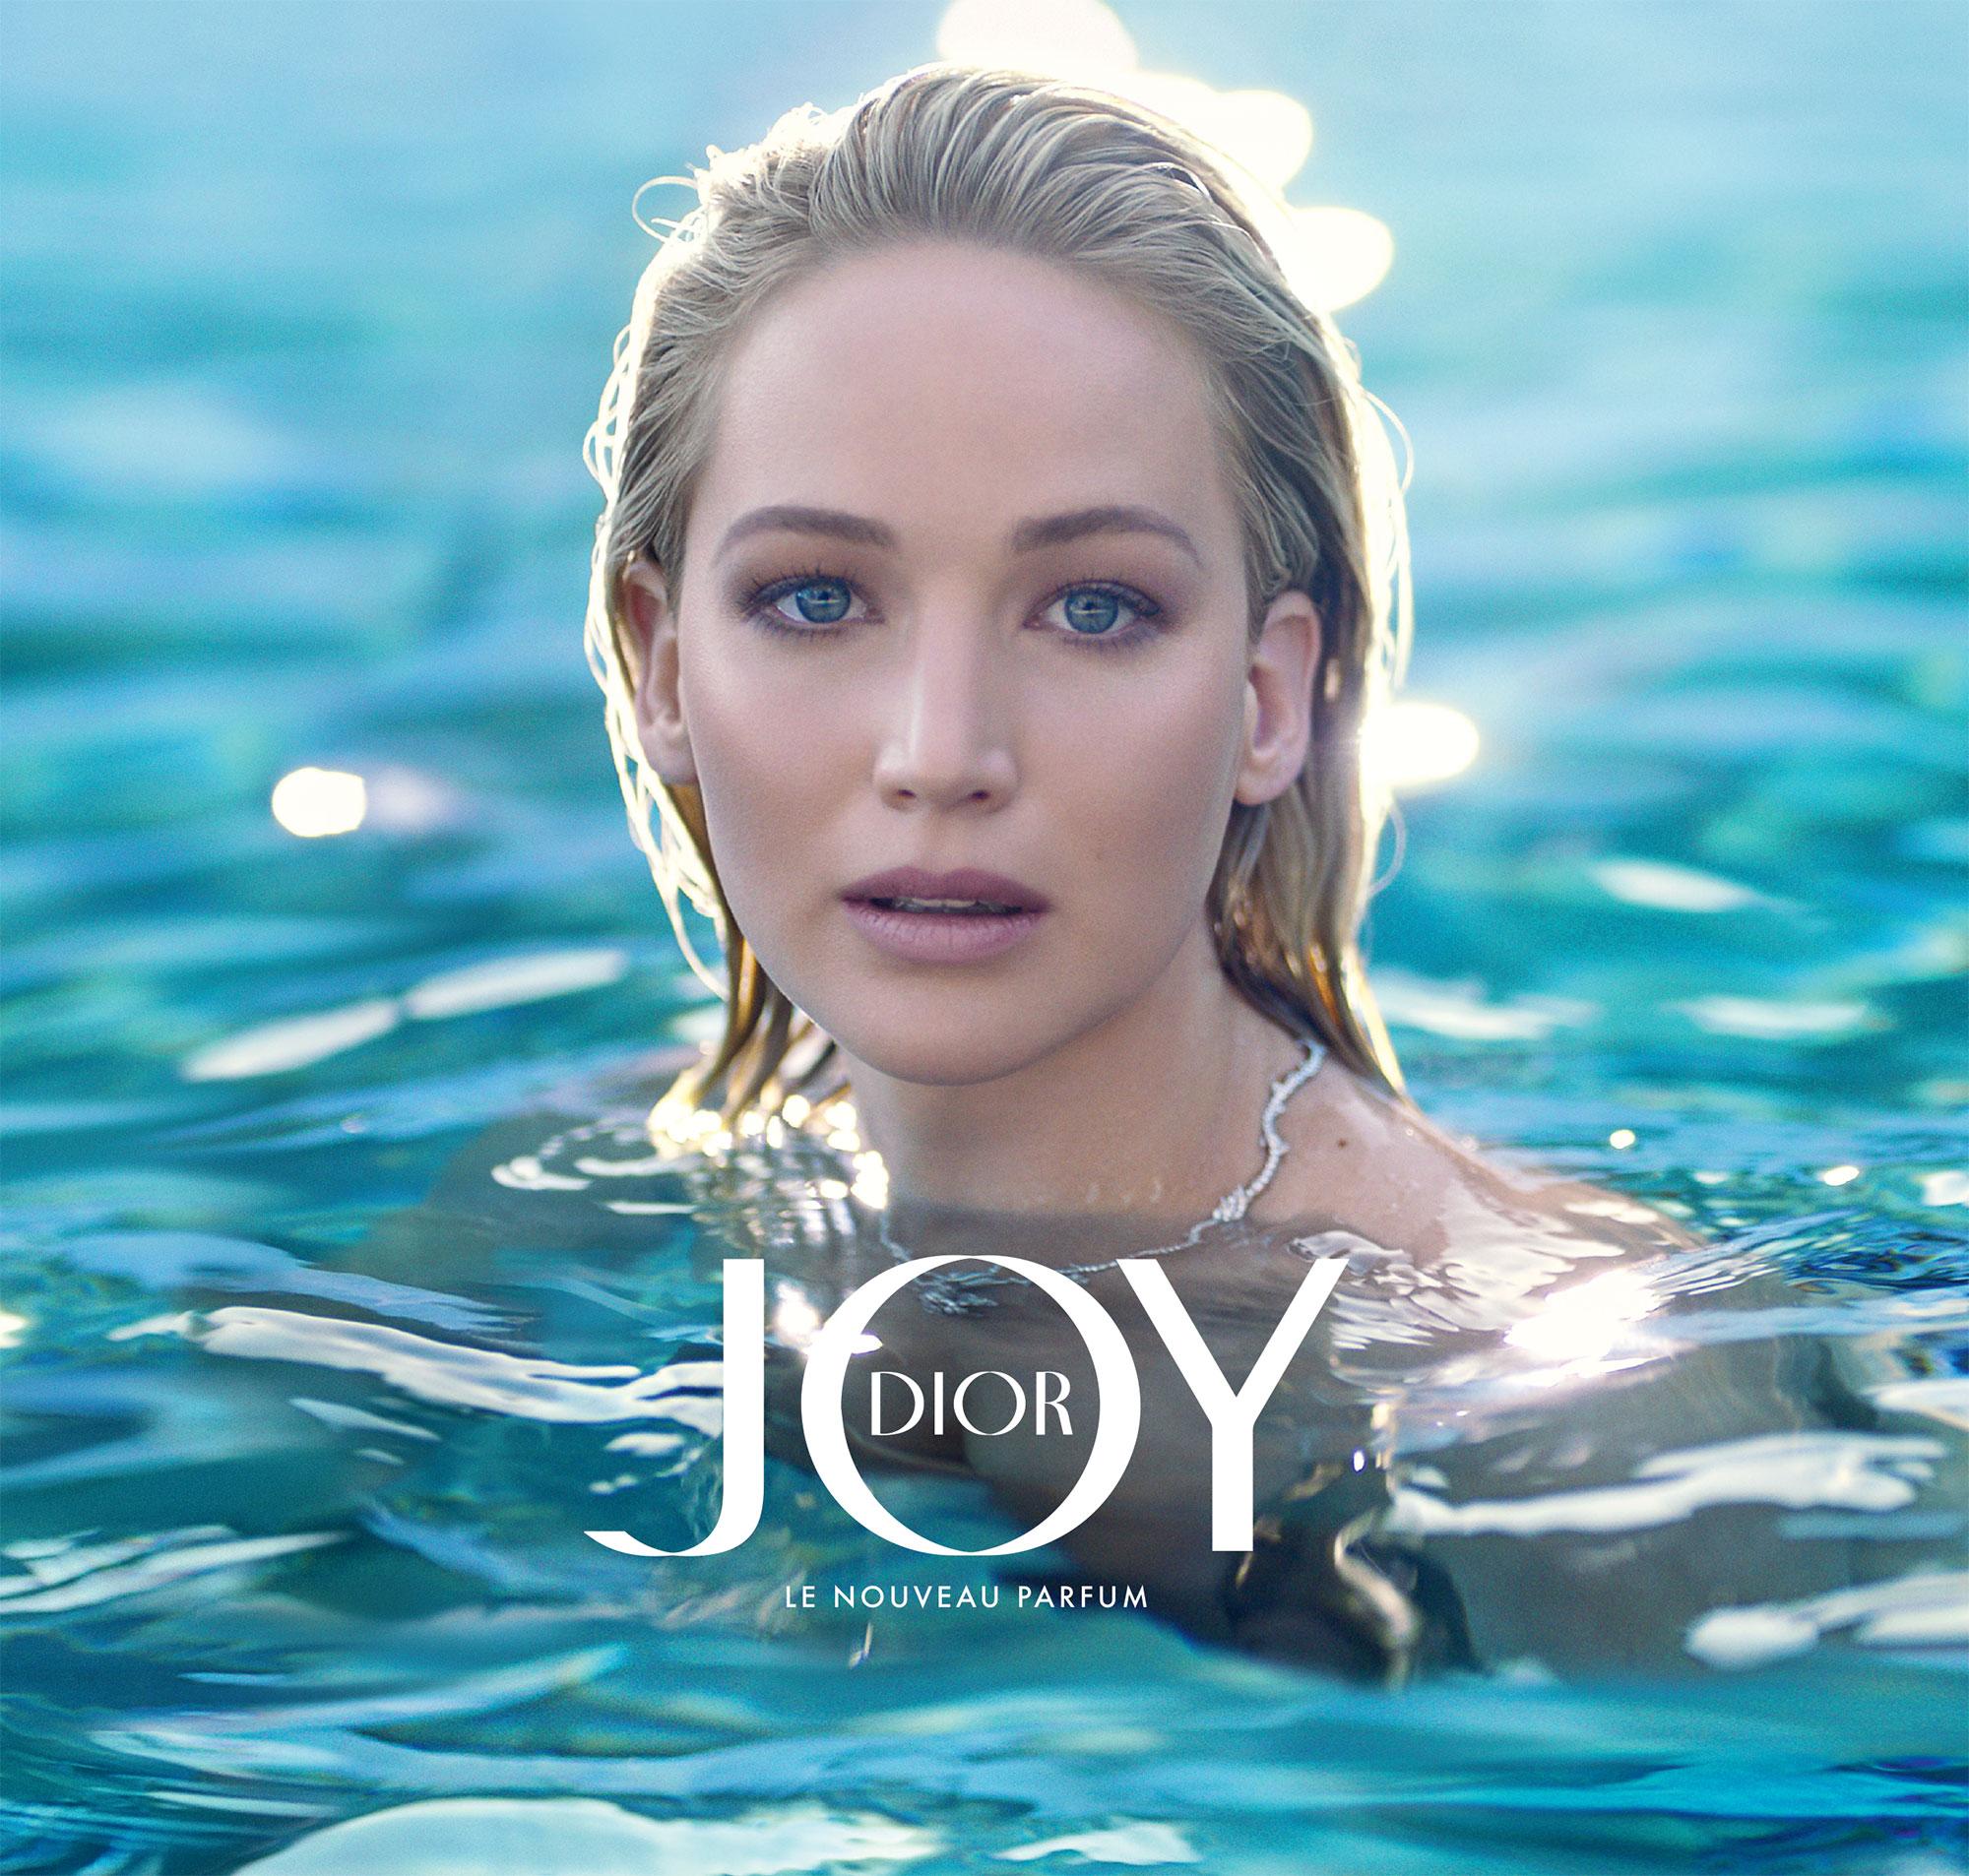 Joy by Dior Christian Dior perfume - a new fragrance for ...